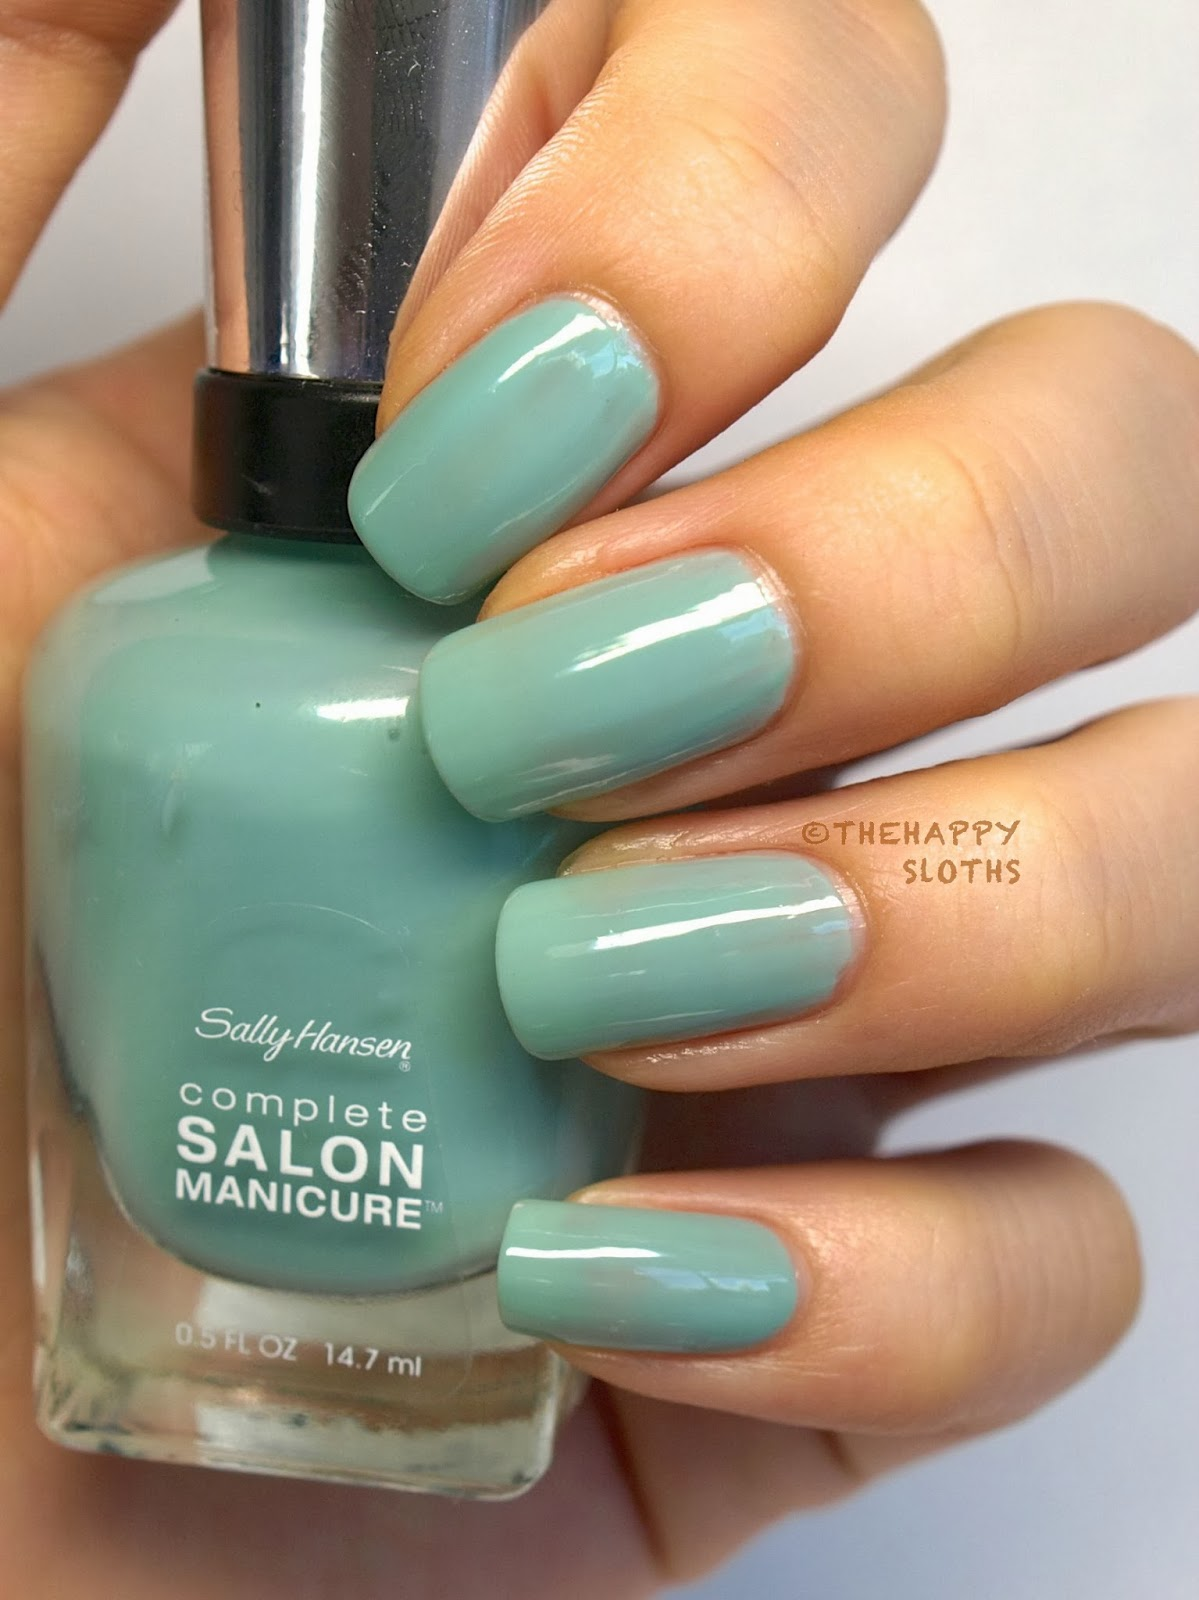 sally hansen csmtko complete salon manicure nail polish. Black Bedroom Furniture Sets. Home Design Ideas